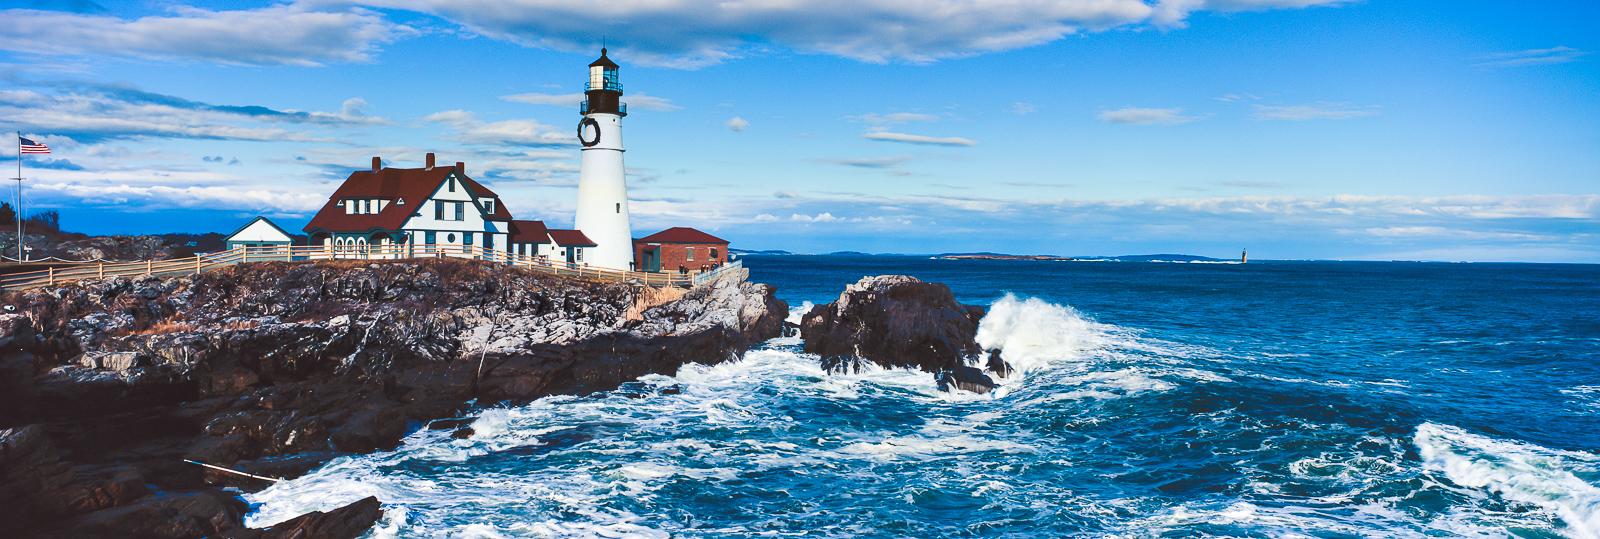 Lighting the Blues,Cape Elizabeth, Lighthouse, Maine, Ocean, photo